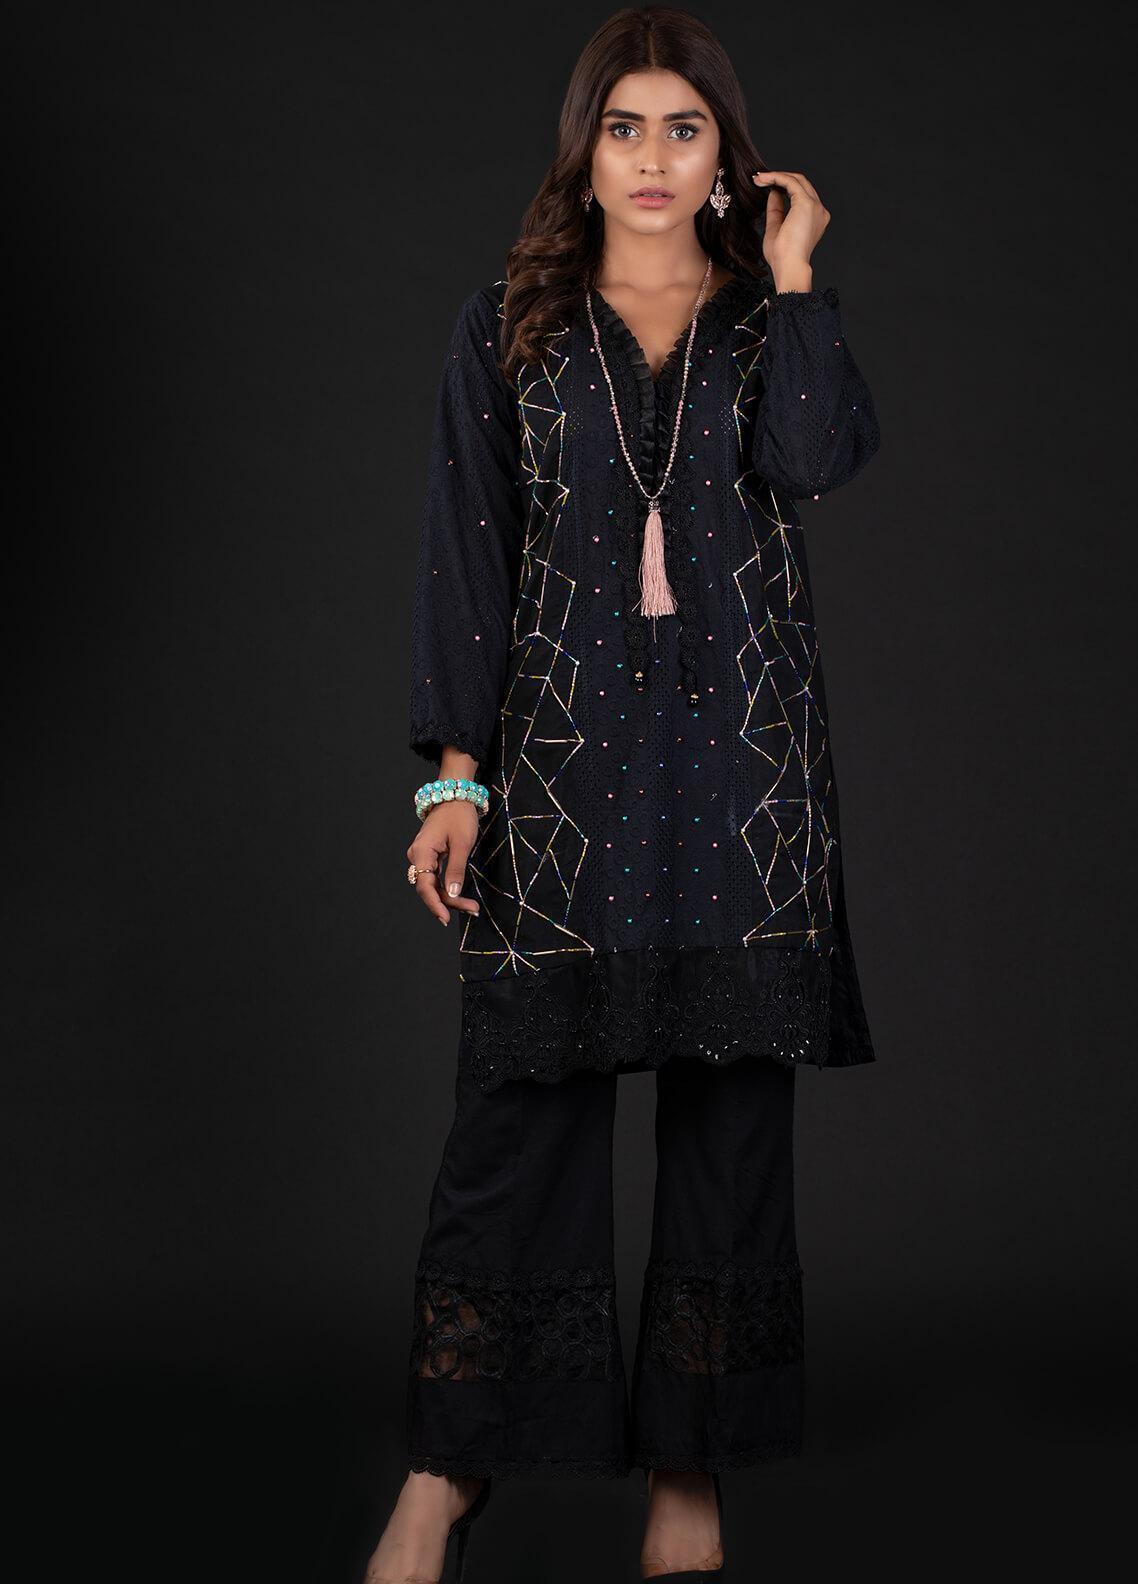 Sidra Mumtaz Embroidered Schiffli Stitched 2 Piece Suit 1B ASTRATTO